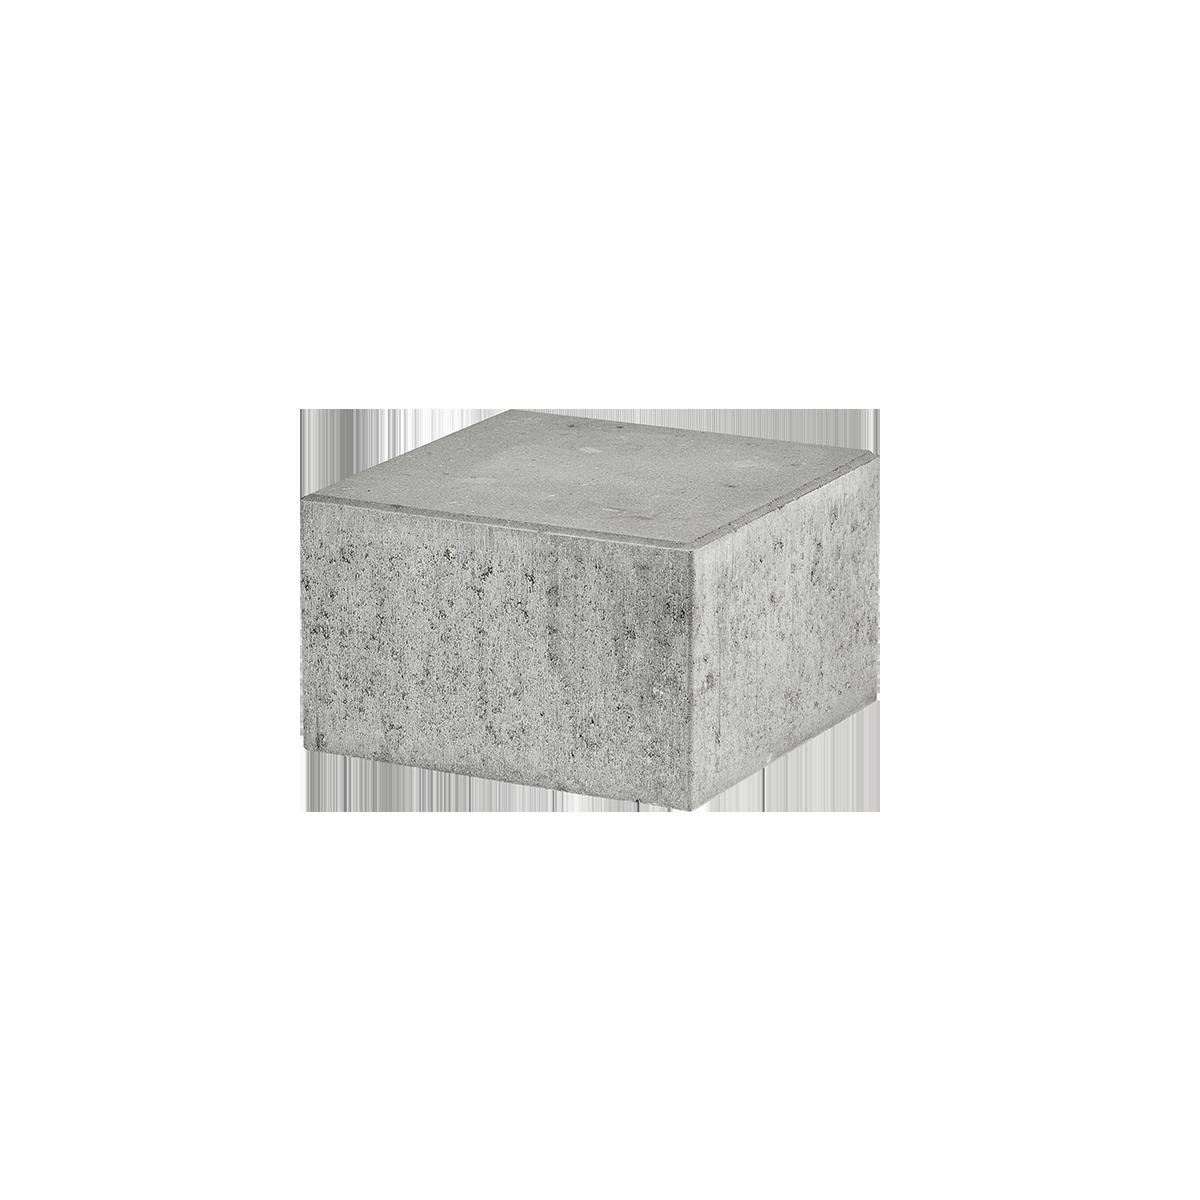 Trappetrin 30x30x18 cm Grå Lige kant